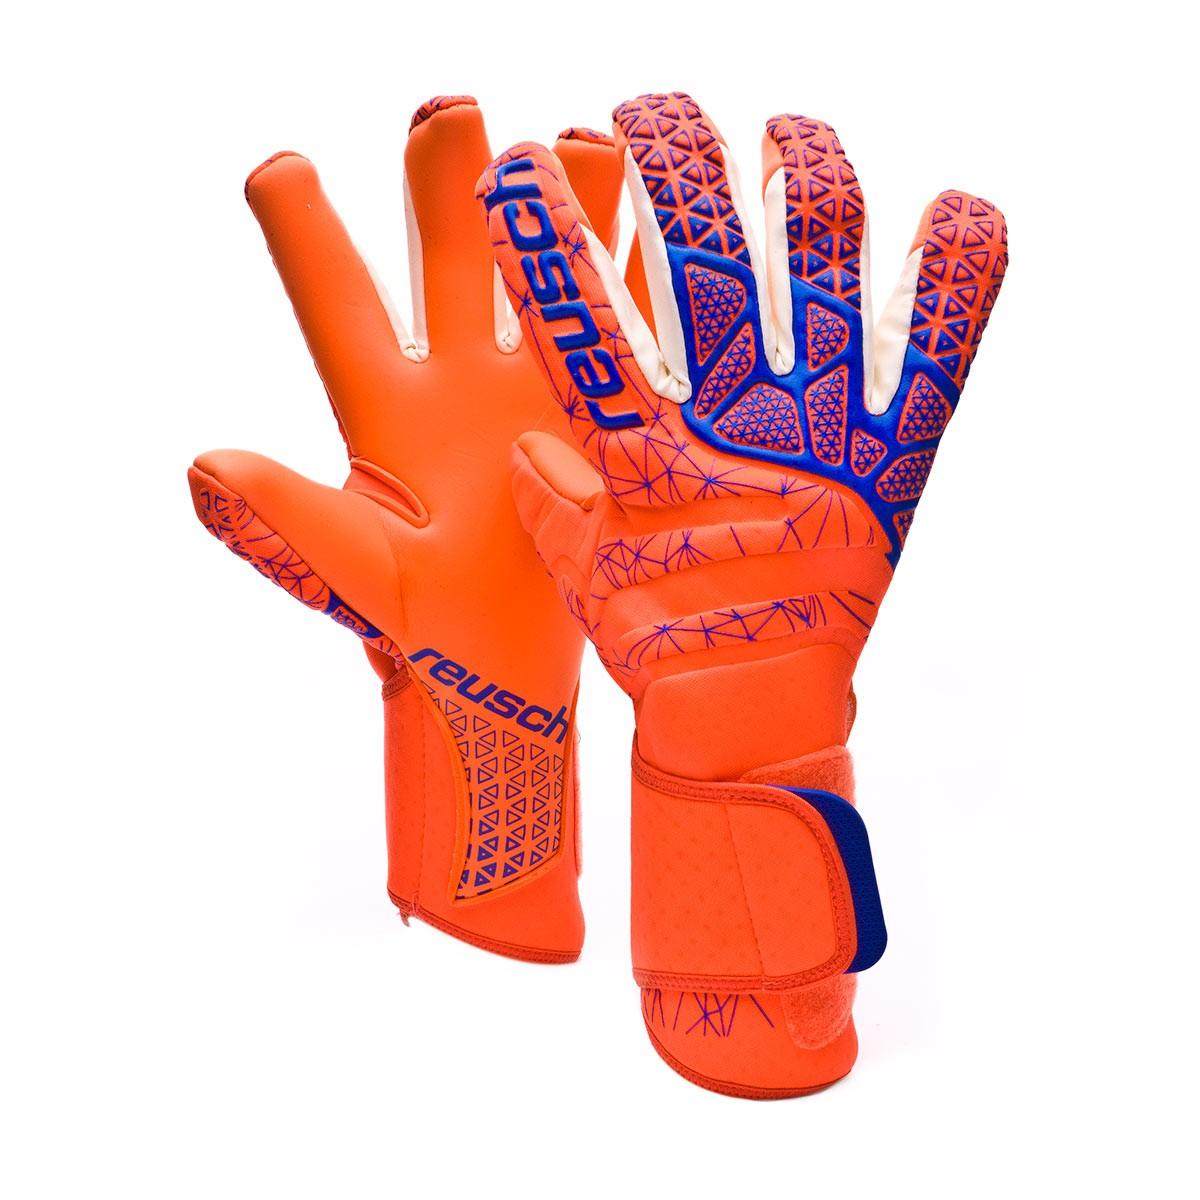 c131fe3b7 Glove Reusch Pure Contact G3 Shocking orange-Blue-Shocking orange -  Football store Fútbol Emotion